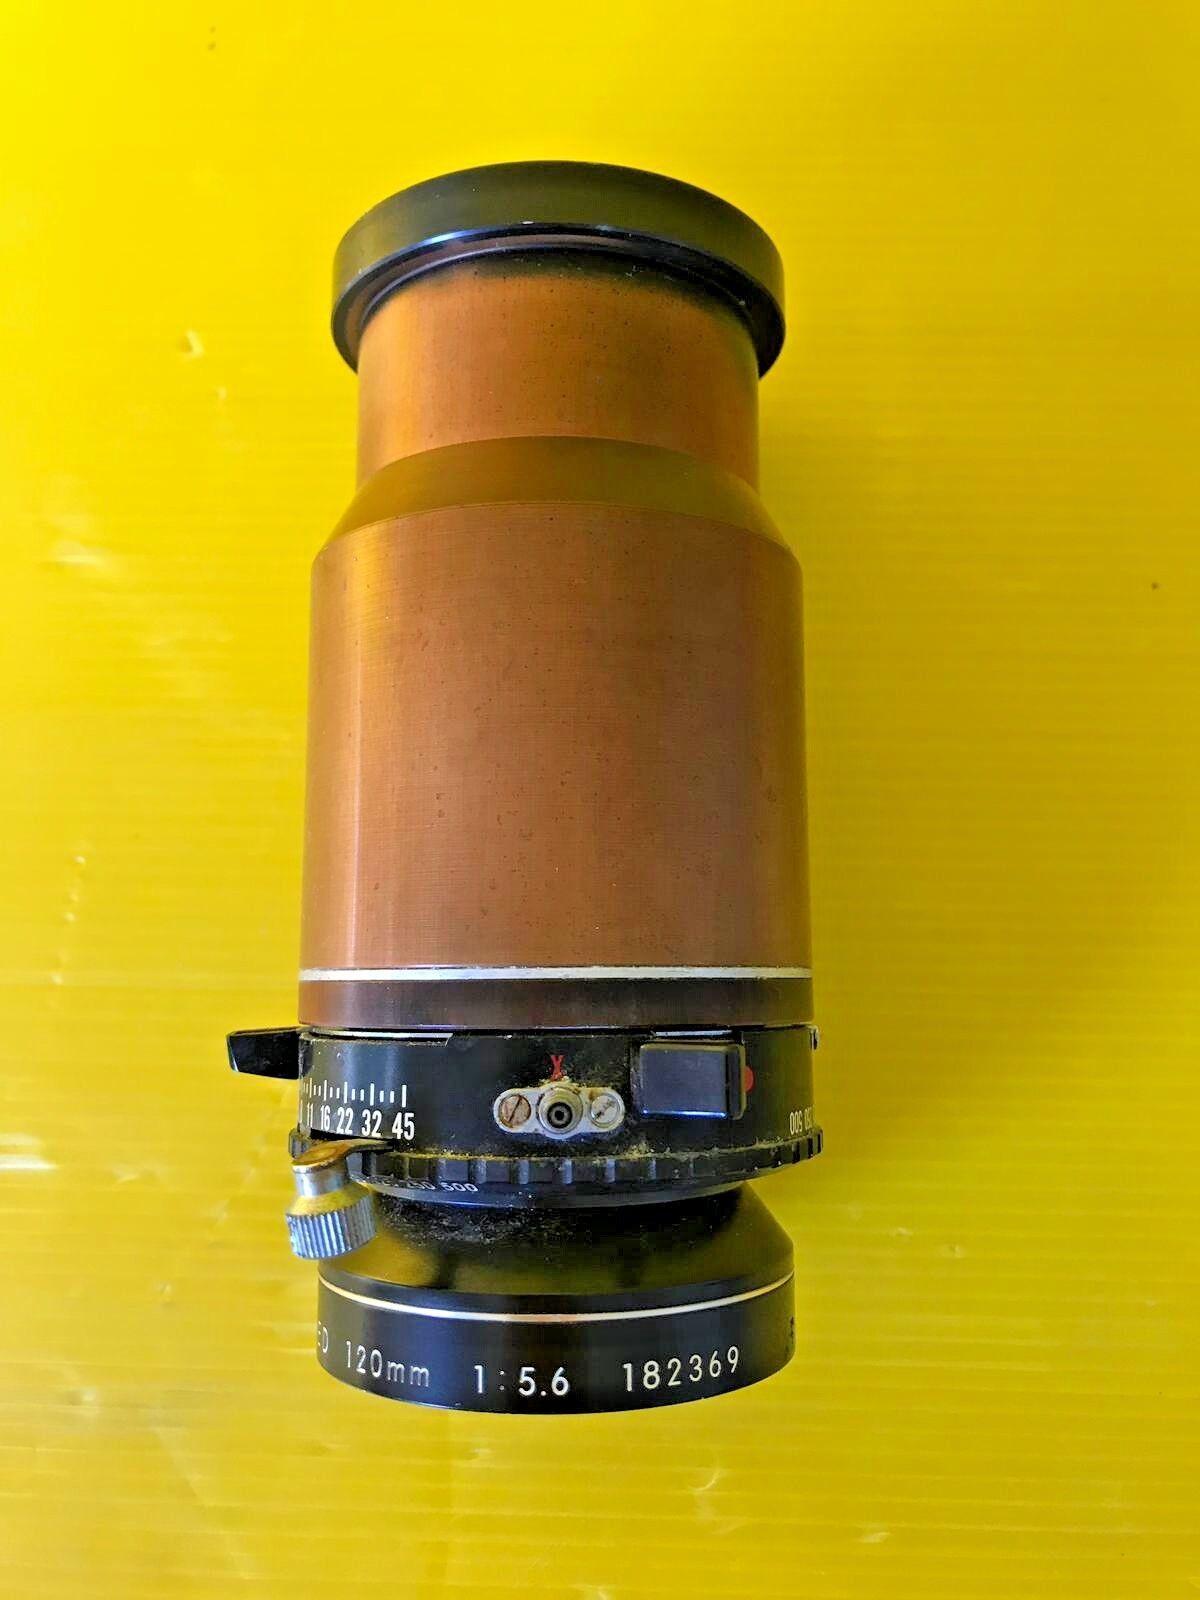 Nikon Nikkor AM ED 120mm f5.6 Large Format Macro Lens